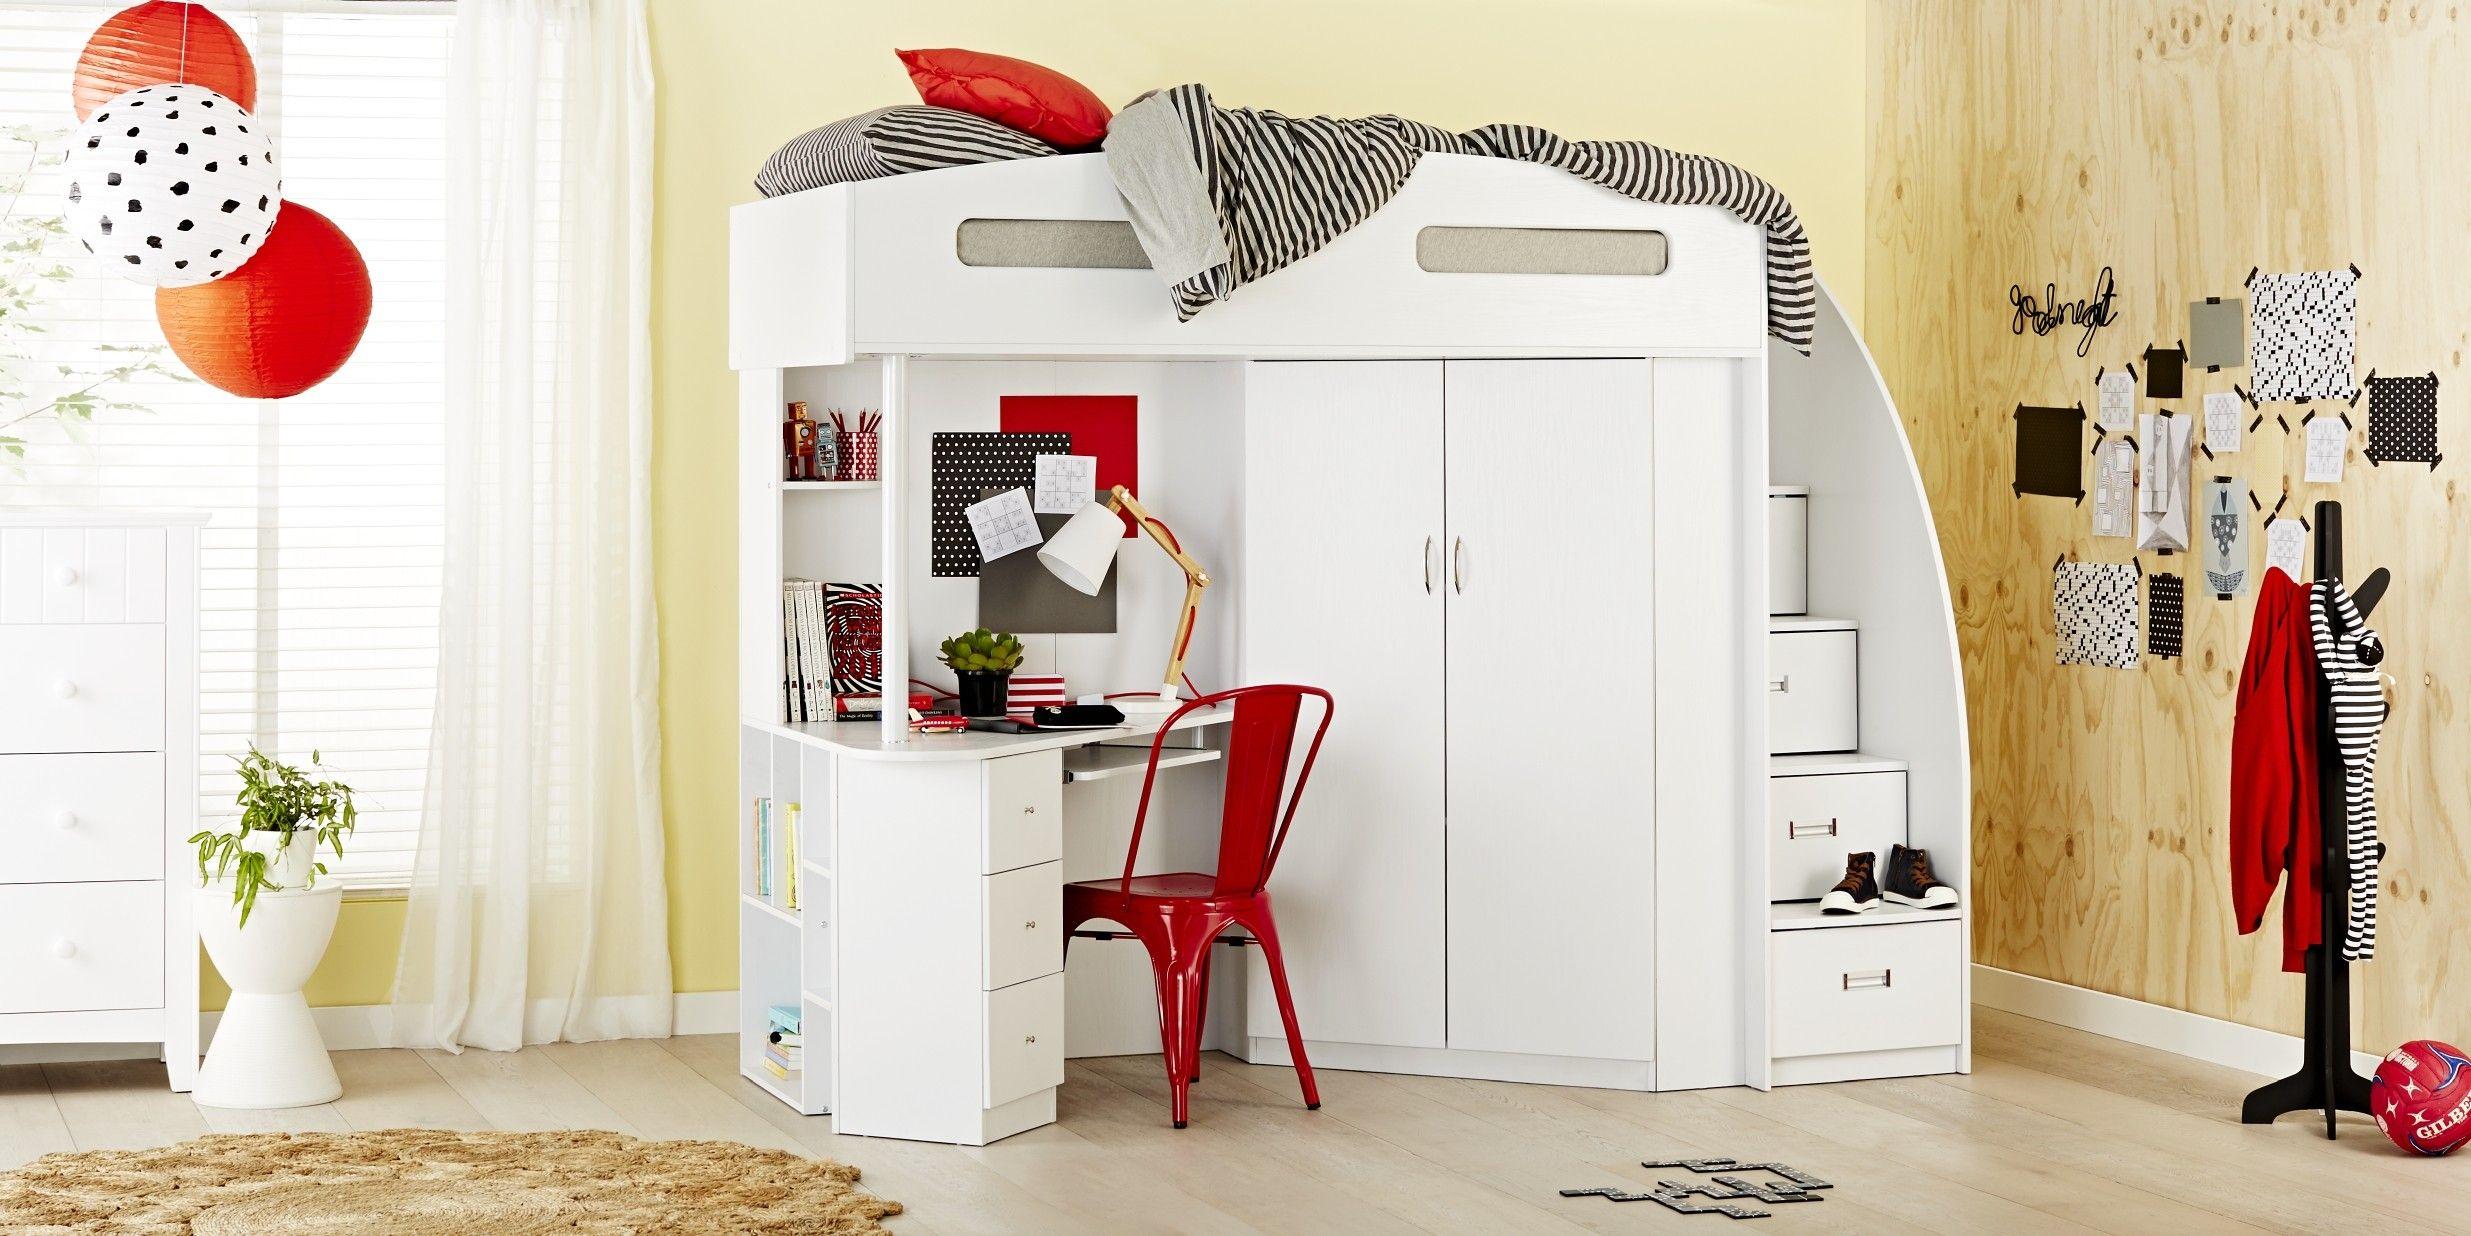 Octavia Study Desk And Storage Bunk Dimensions W x L x H